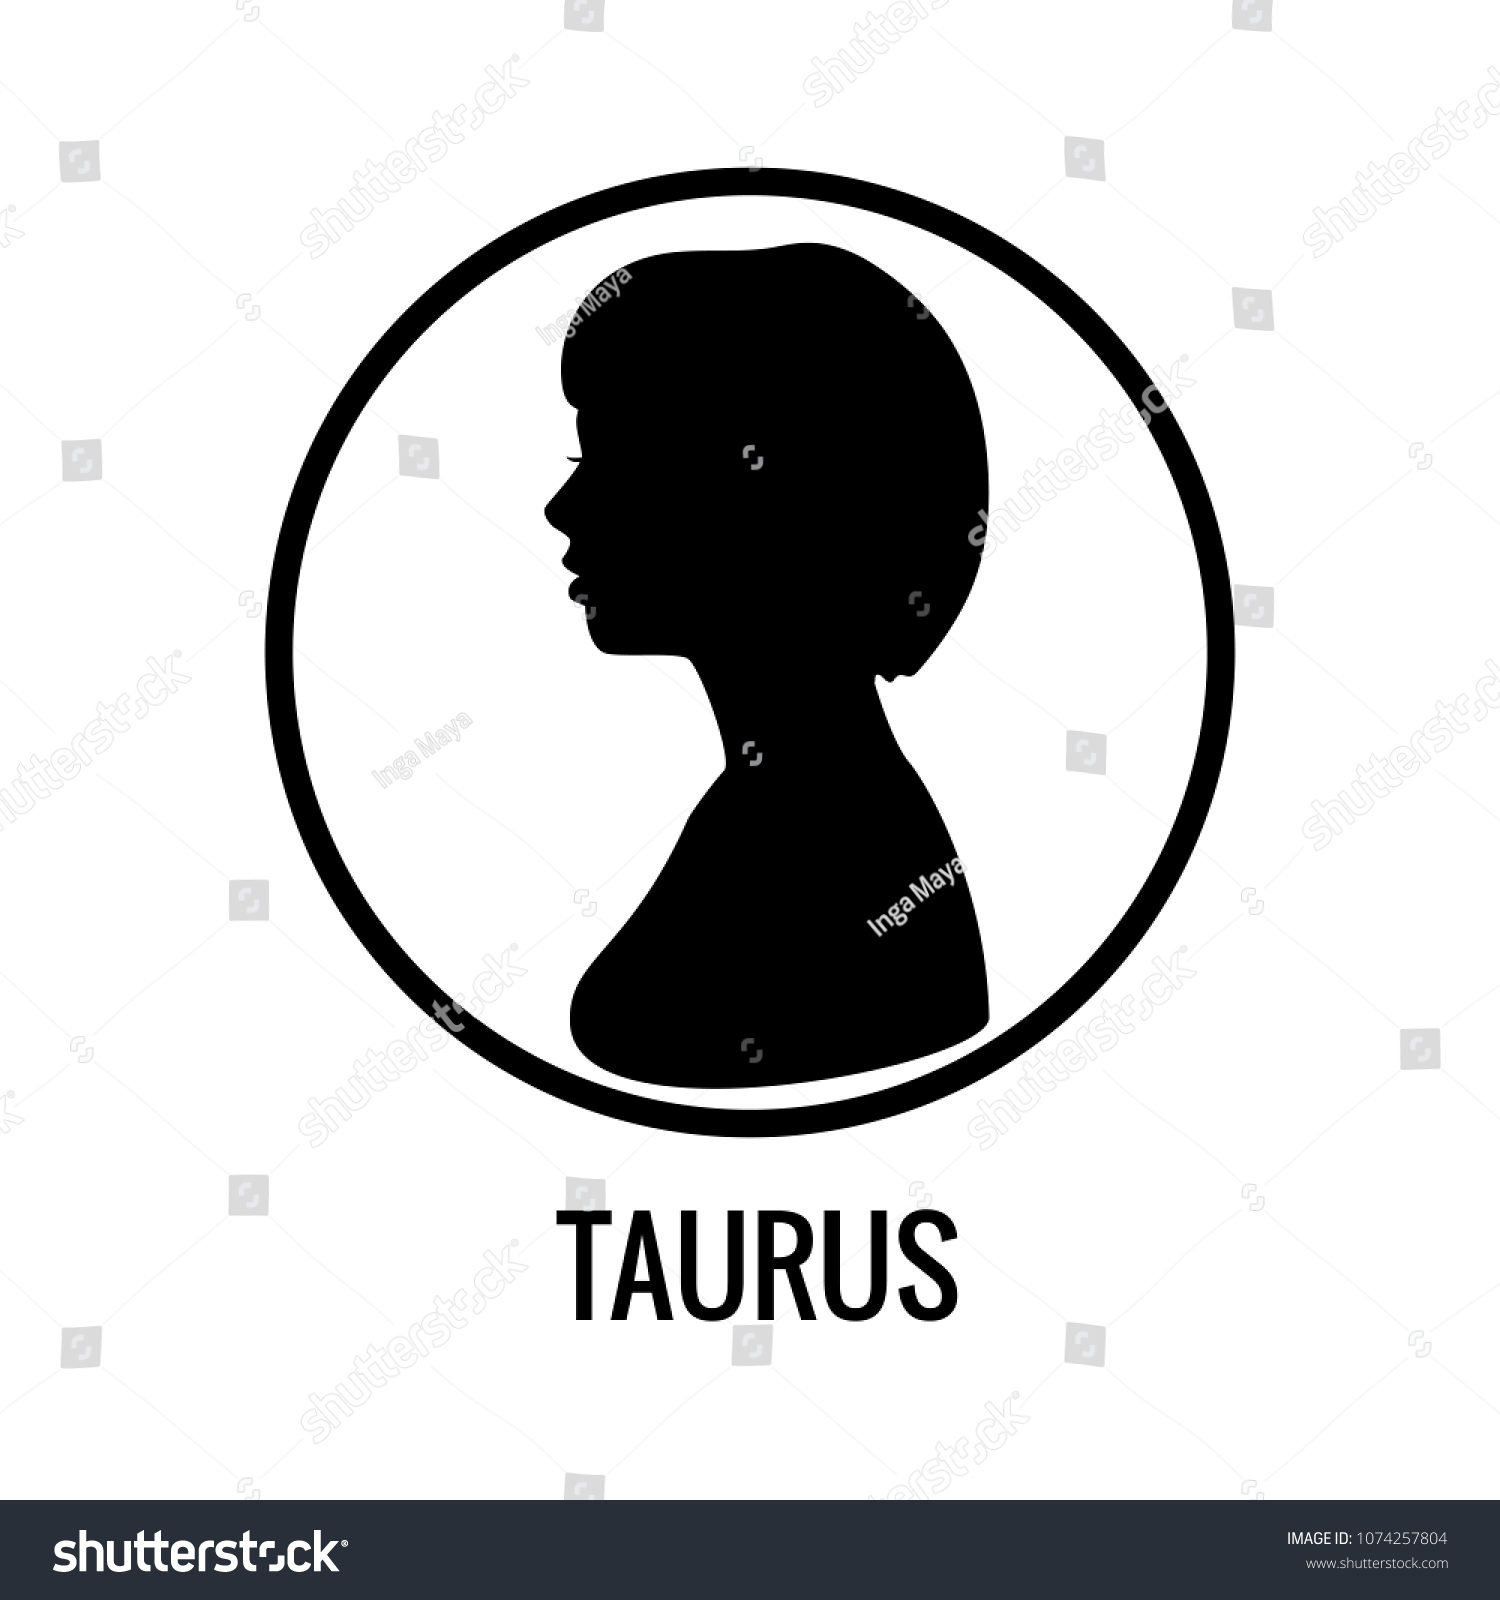 Zodiac Signs Taurus Black Silhouettes Girl Stock Vector 1074257804